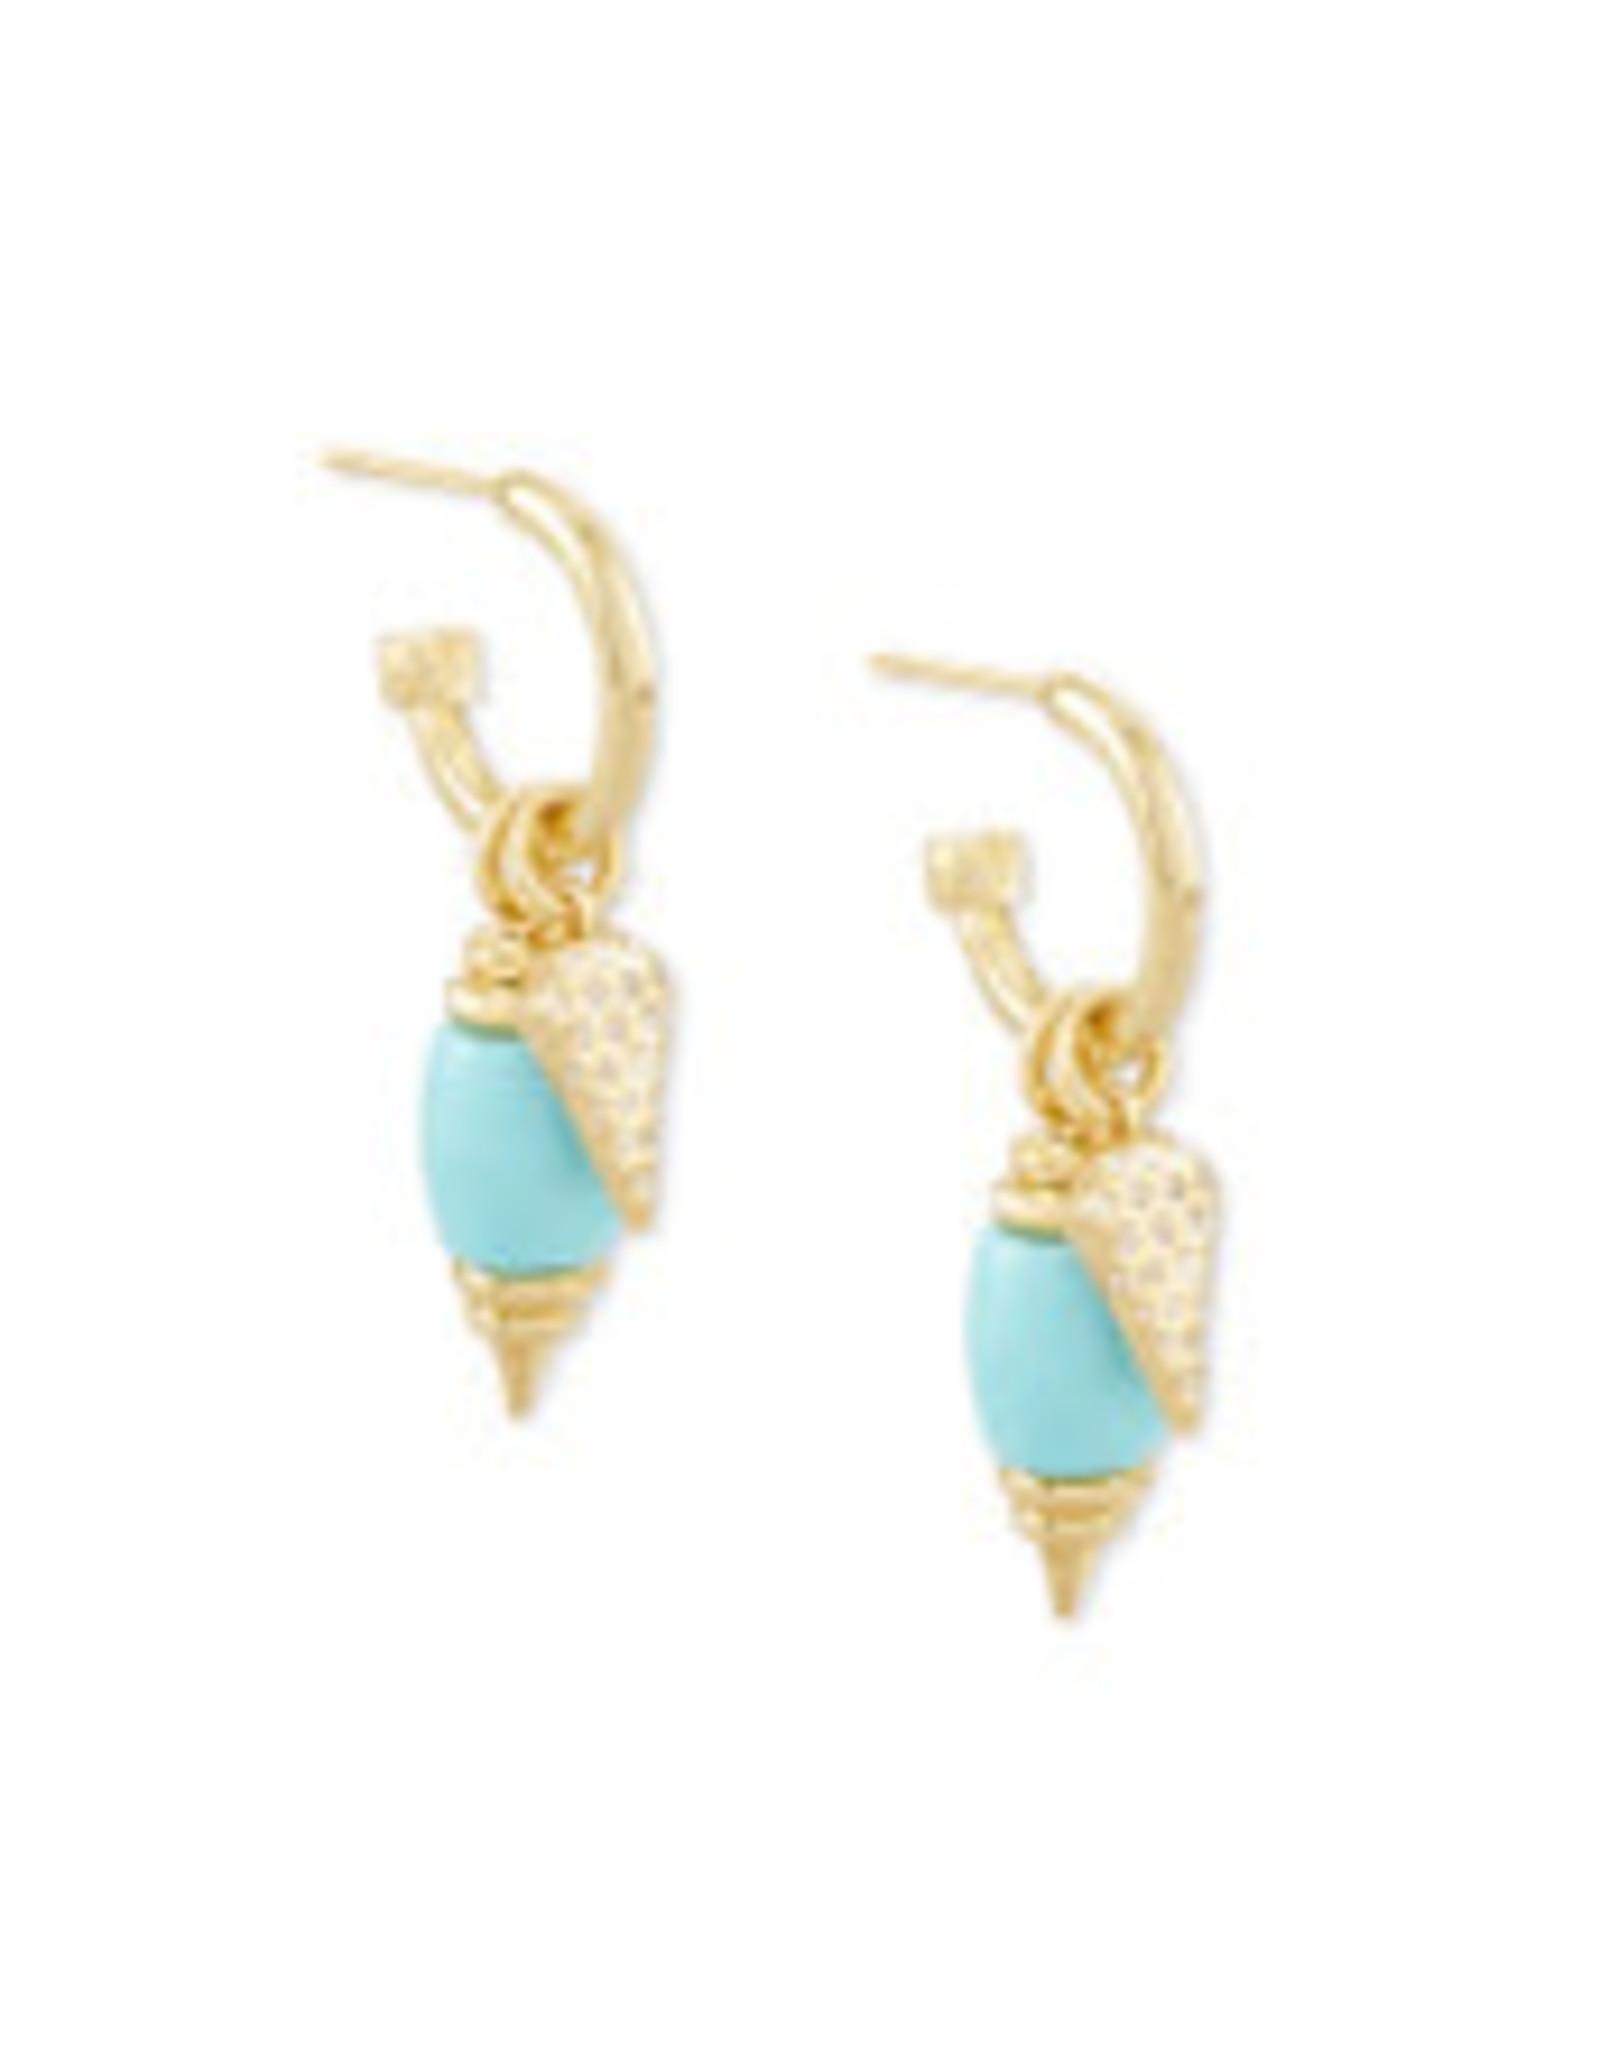 Kendra Scott Kendra Scott Earrings- Demi Charm